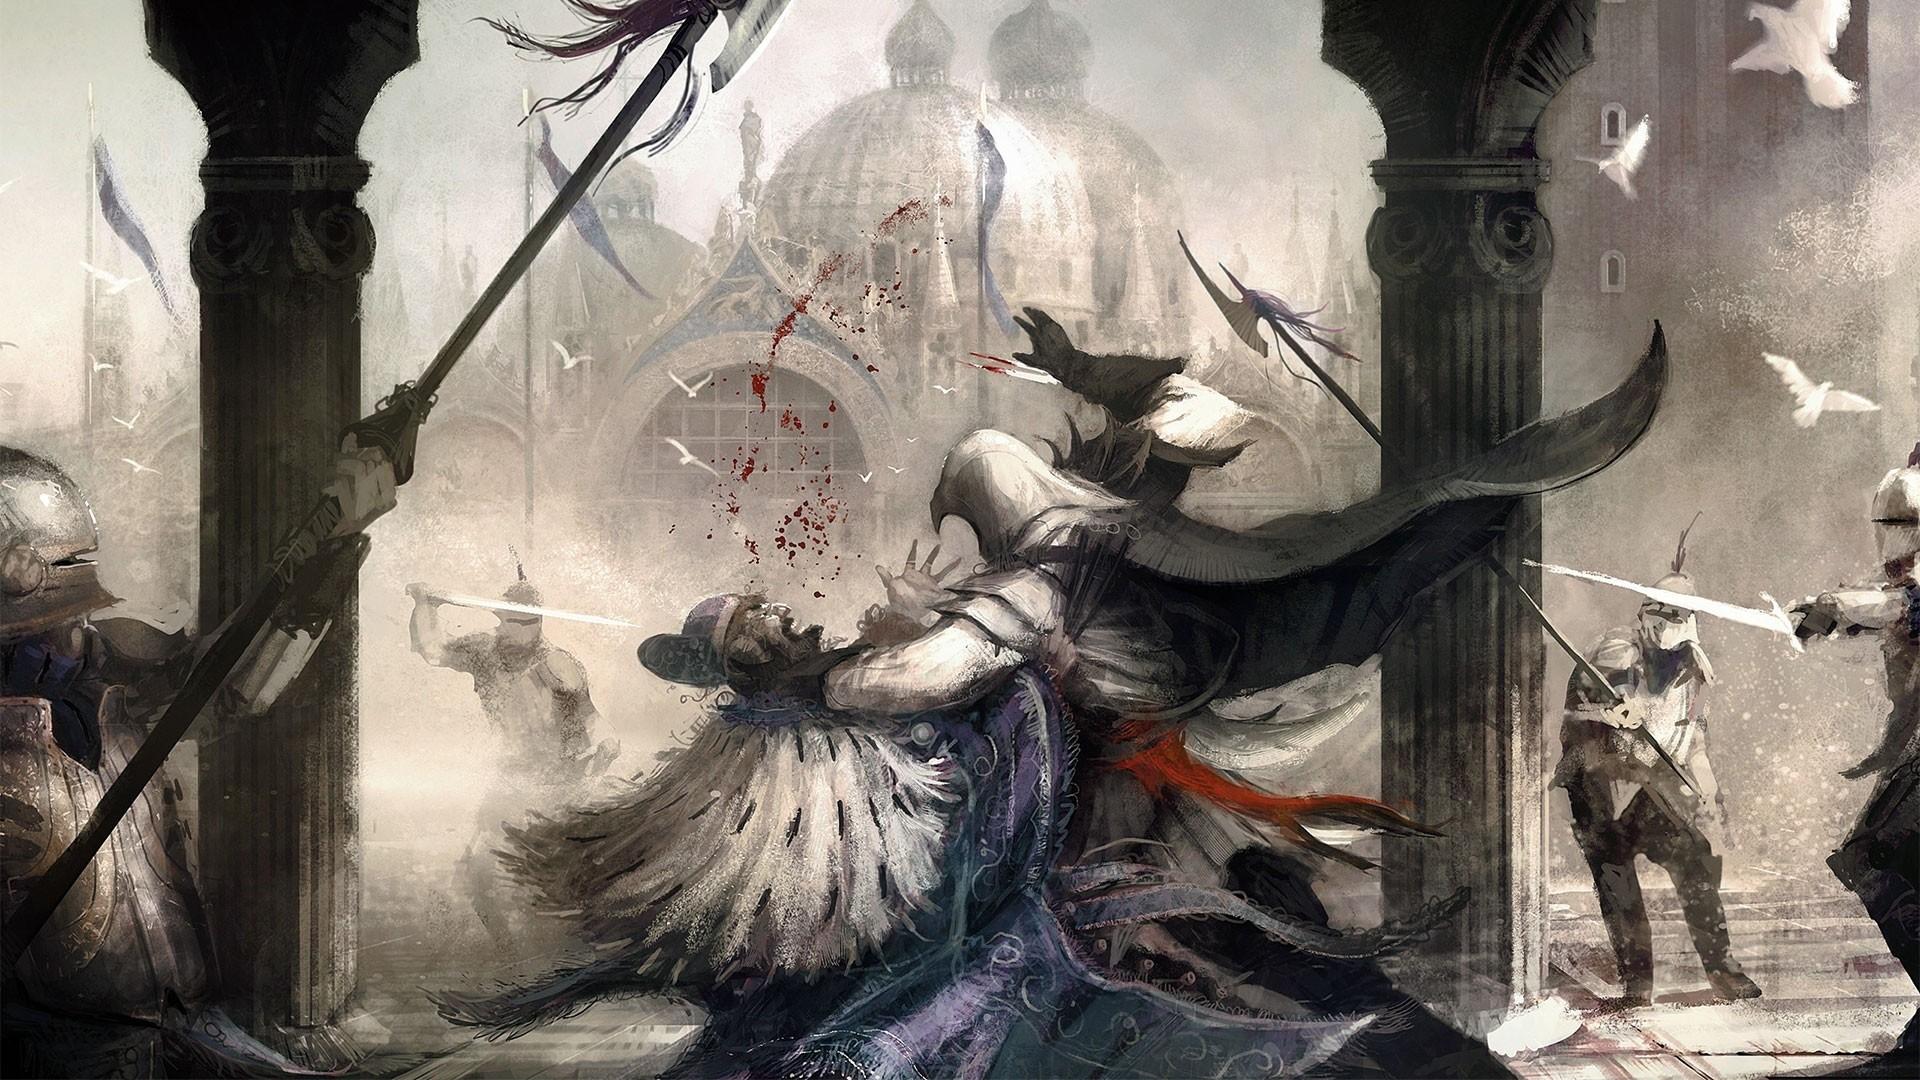 Assassin's Creed 2 Wallpaper Image